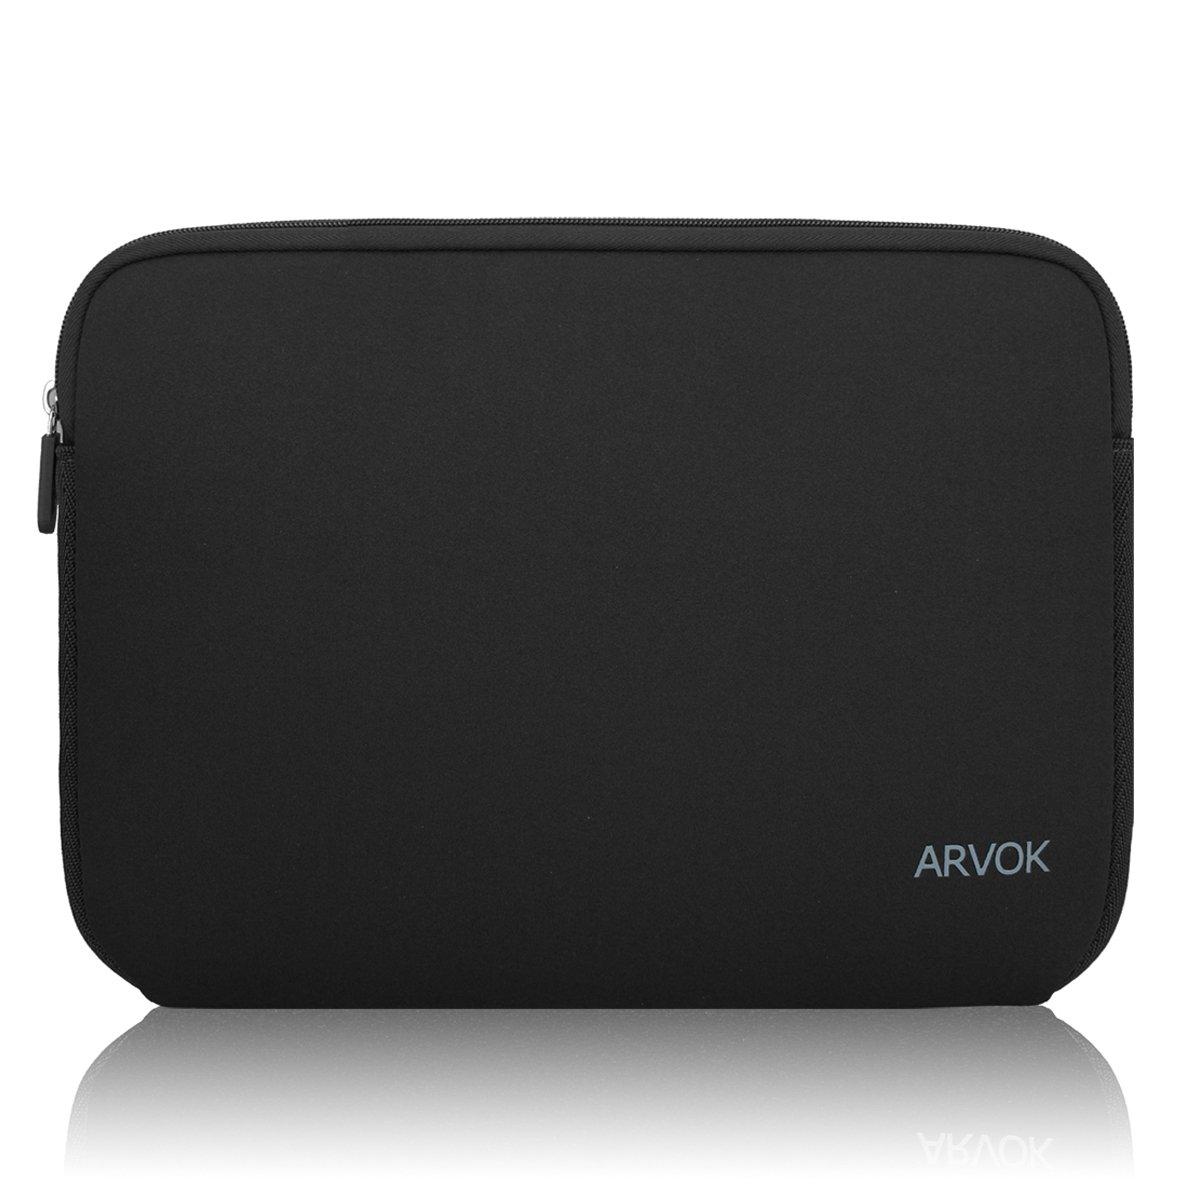 ARVOK Multi Color Water Resistant Neoprene Briefcase